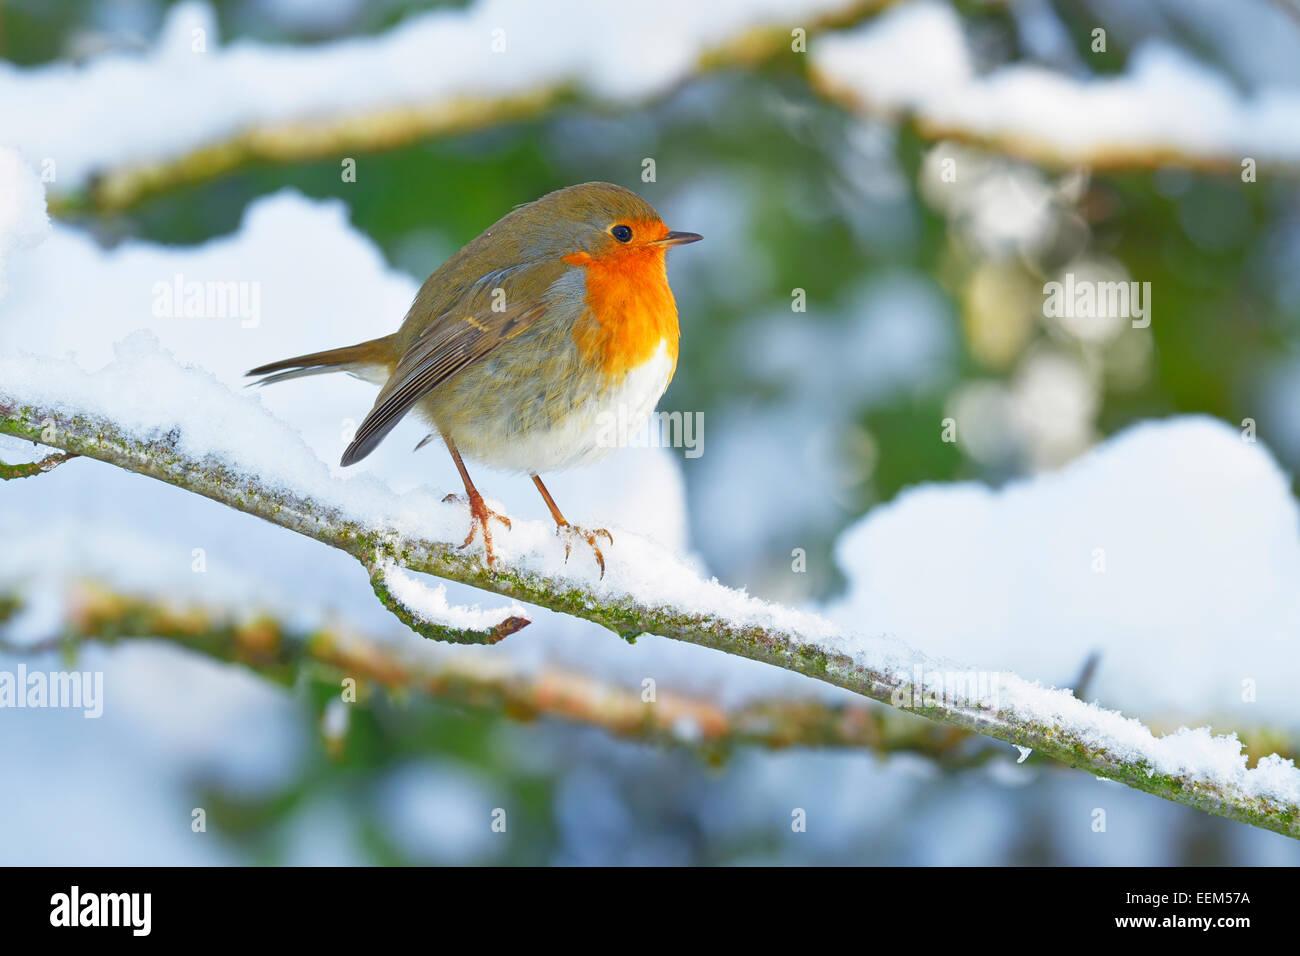 European Robin (Erithacus rubecula), sitting on snowy branch, Switzerland - Stock Image